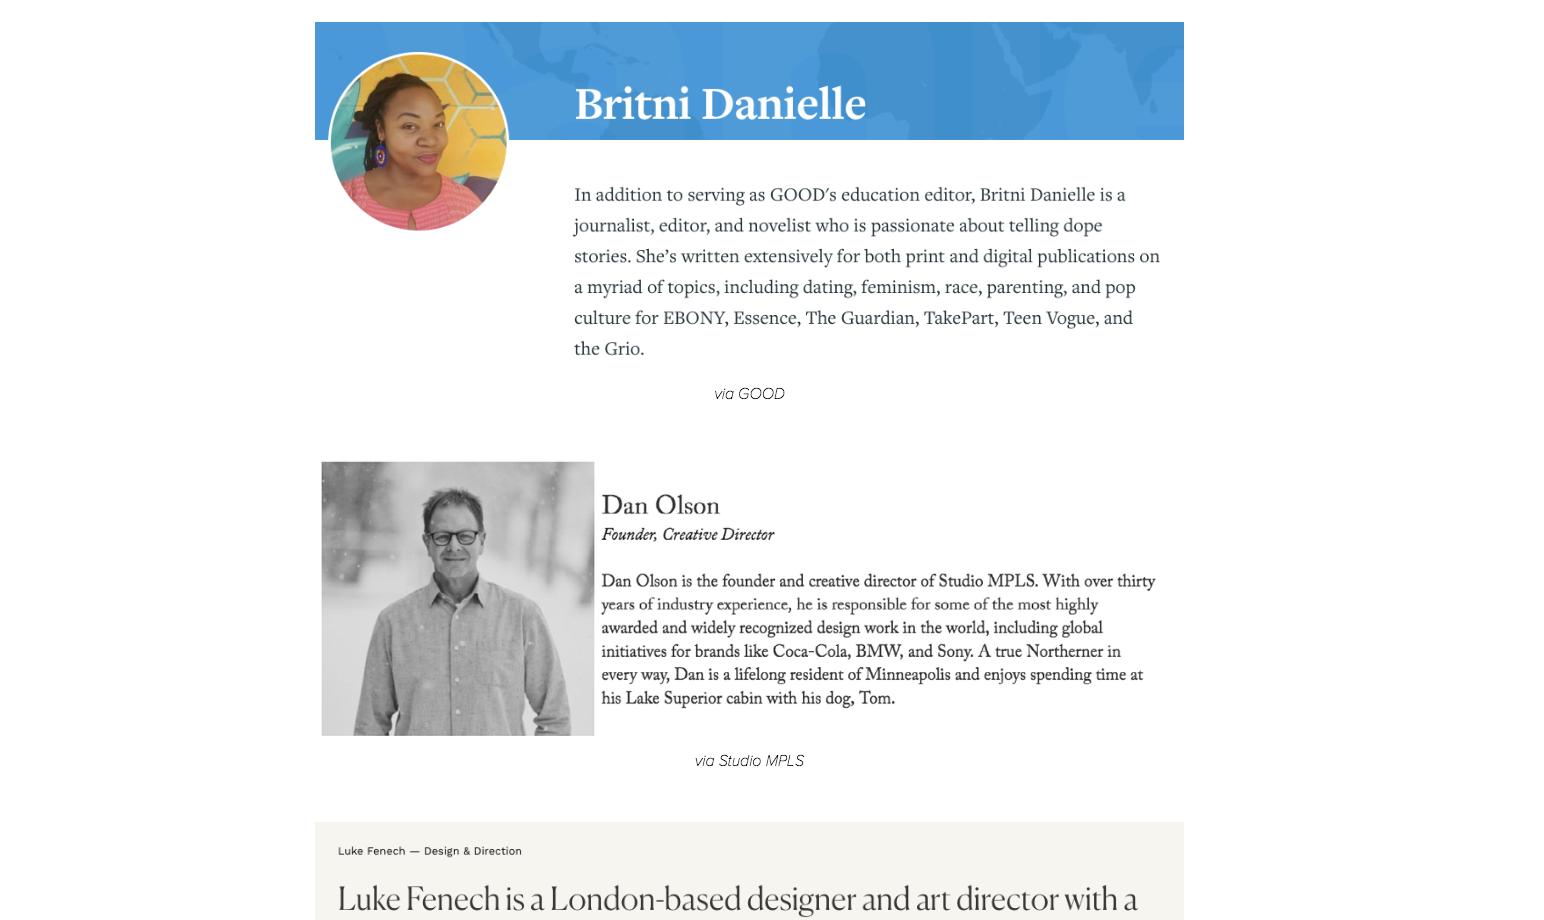 Professional Bio Examples